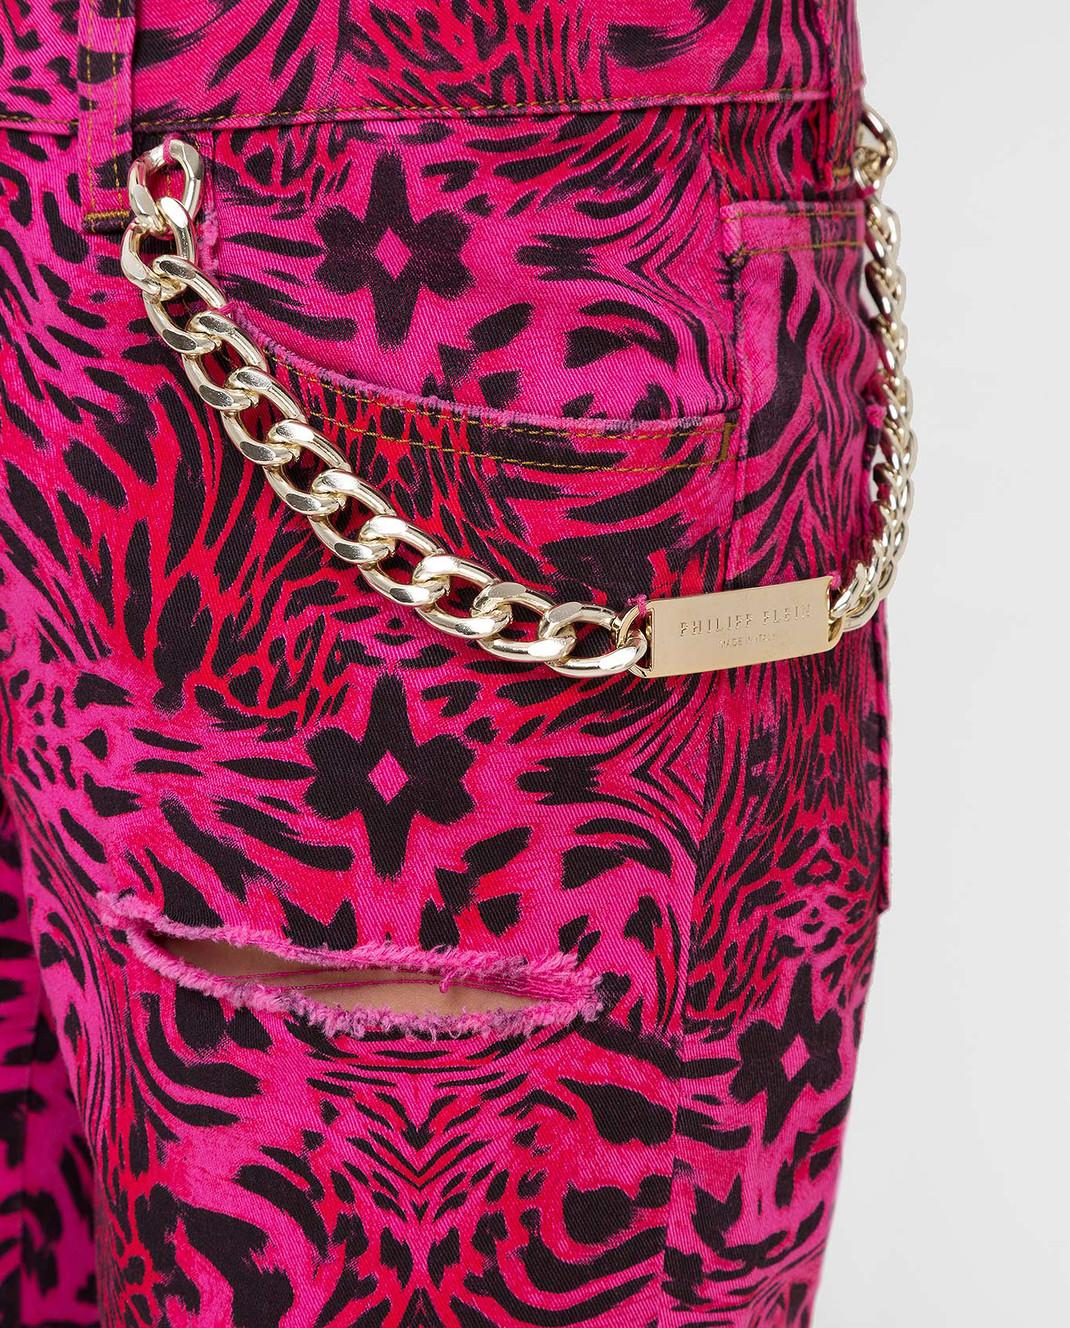 Philipp Plein Розовые джинсы CWDT0208 изображение 5